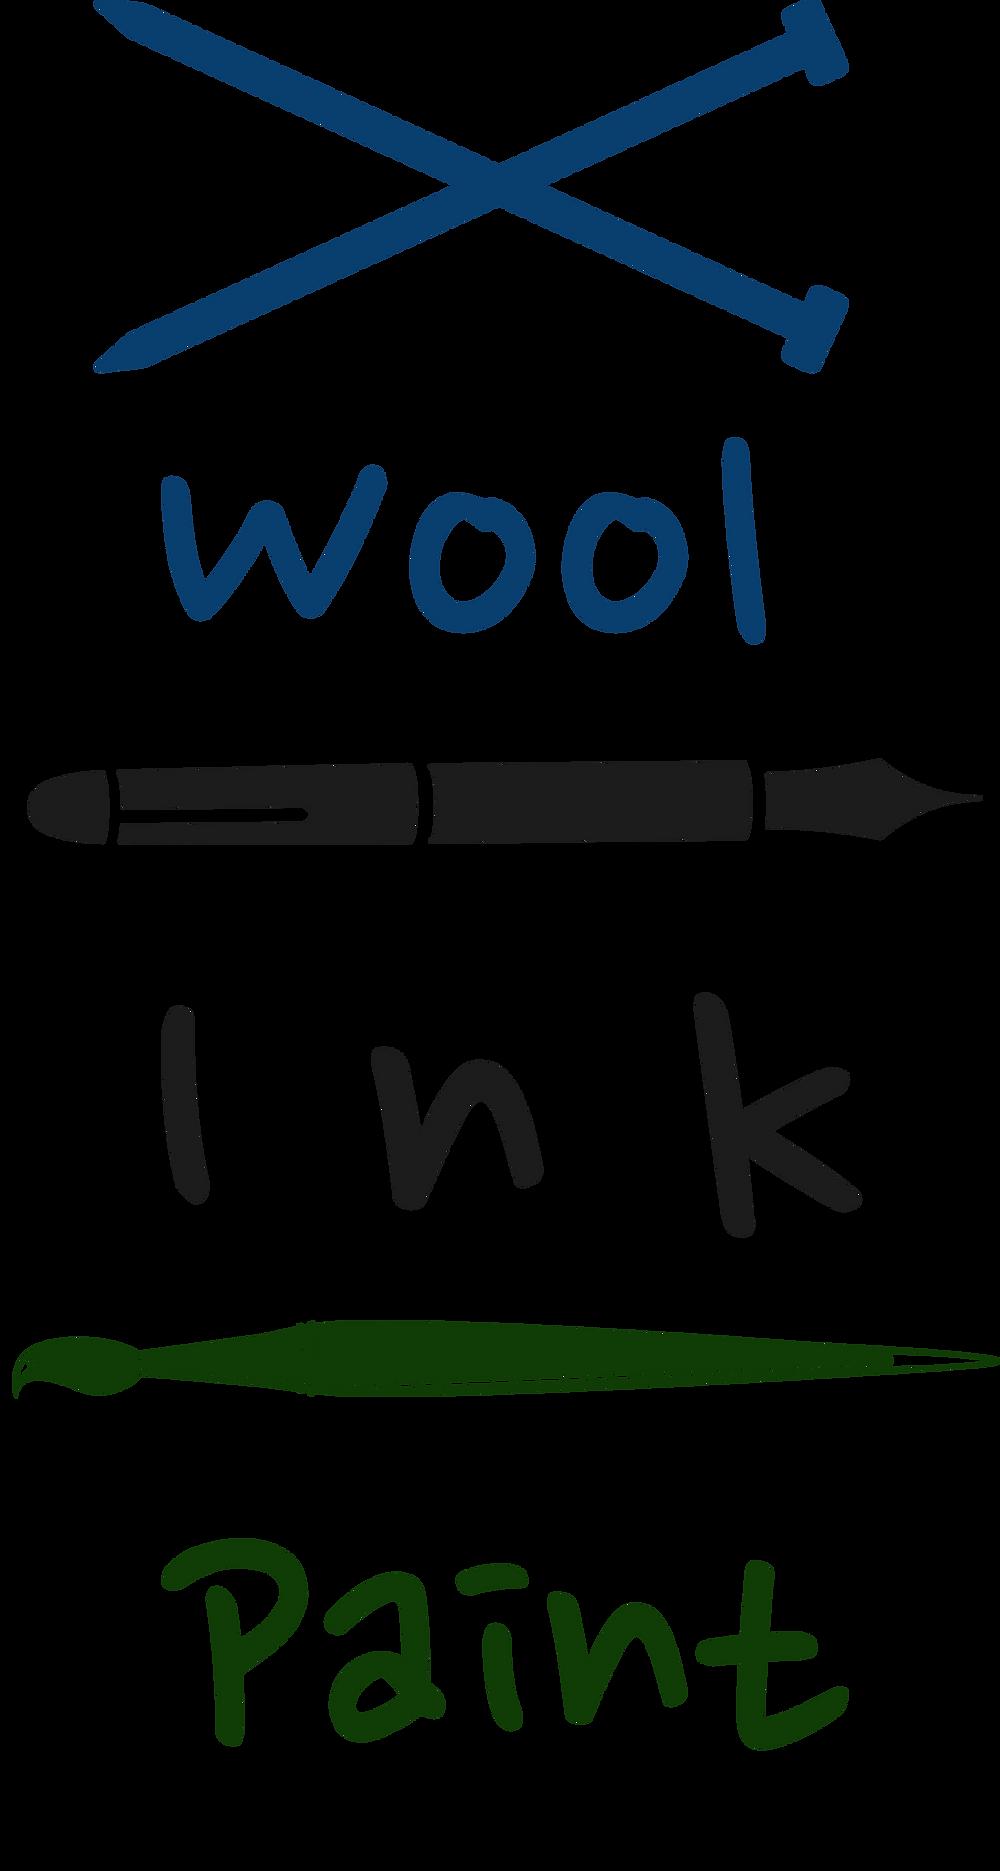 Wool Ink Paint logo - knitting needles, pen, paint brush